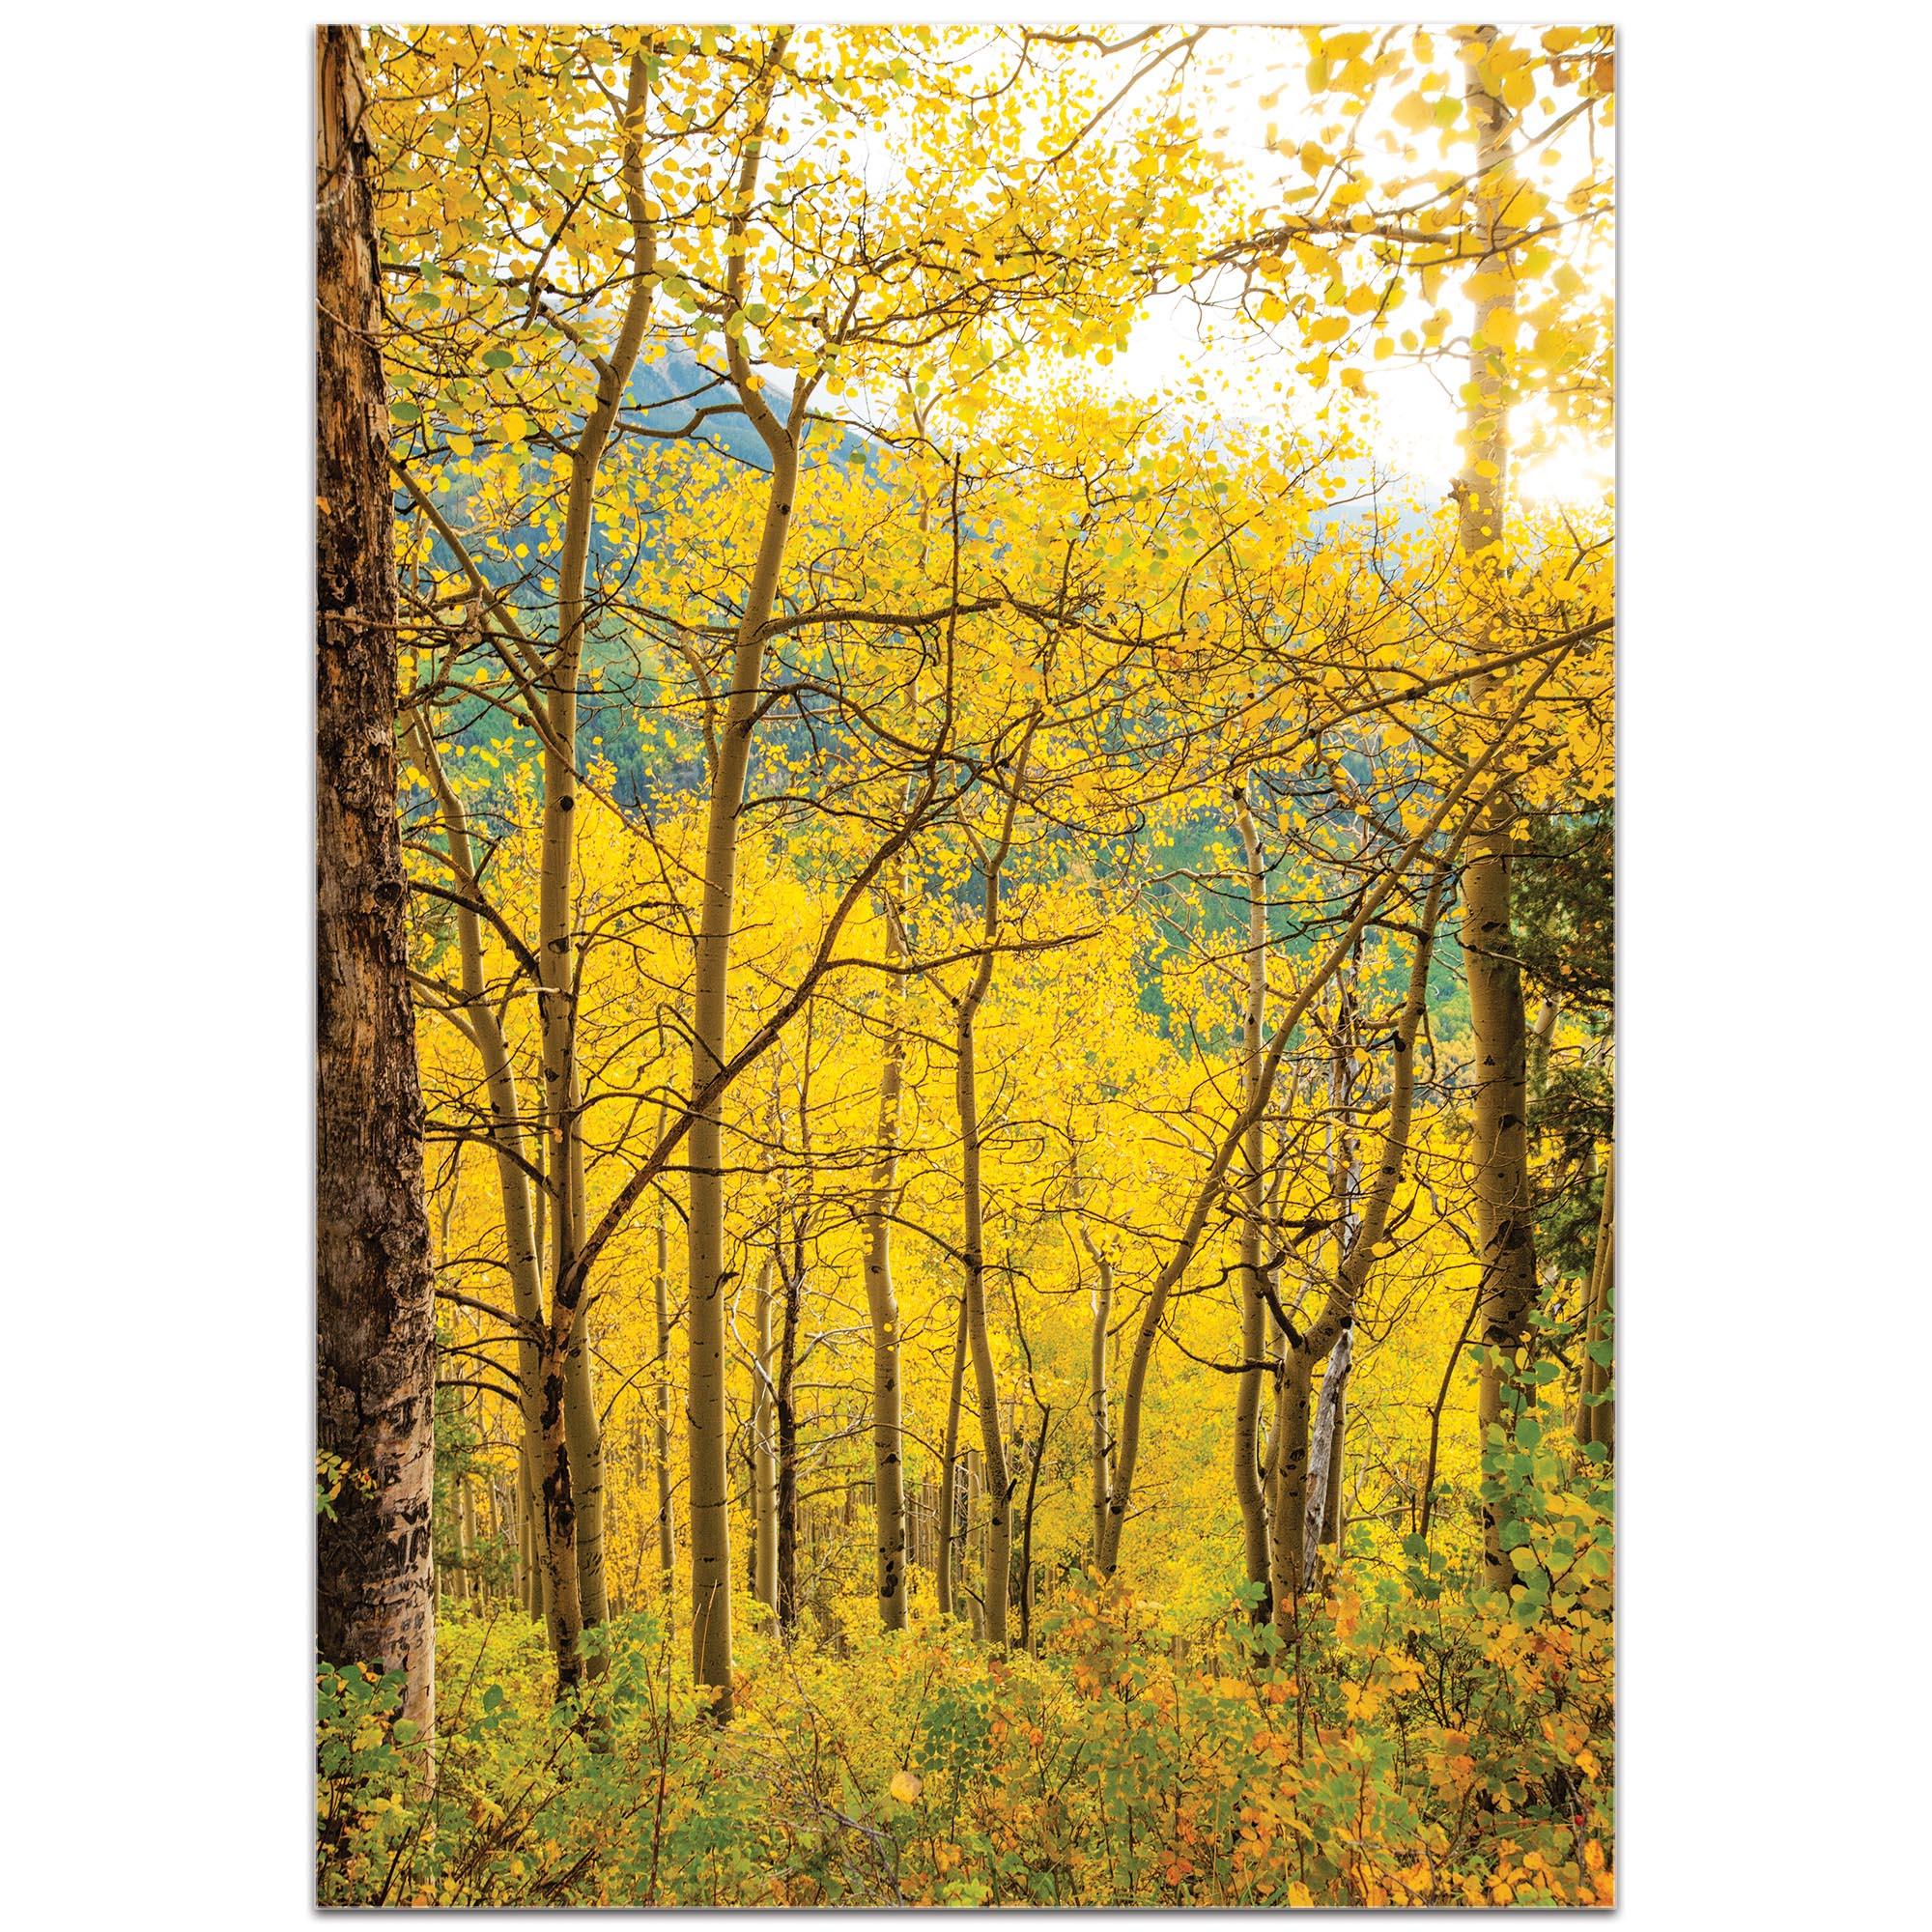 Landscape Photography 'Aspen Path' - Autumn Nature Art on Metal or Plexiglass - Image 2